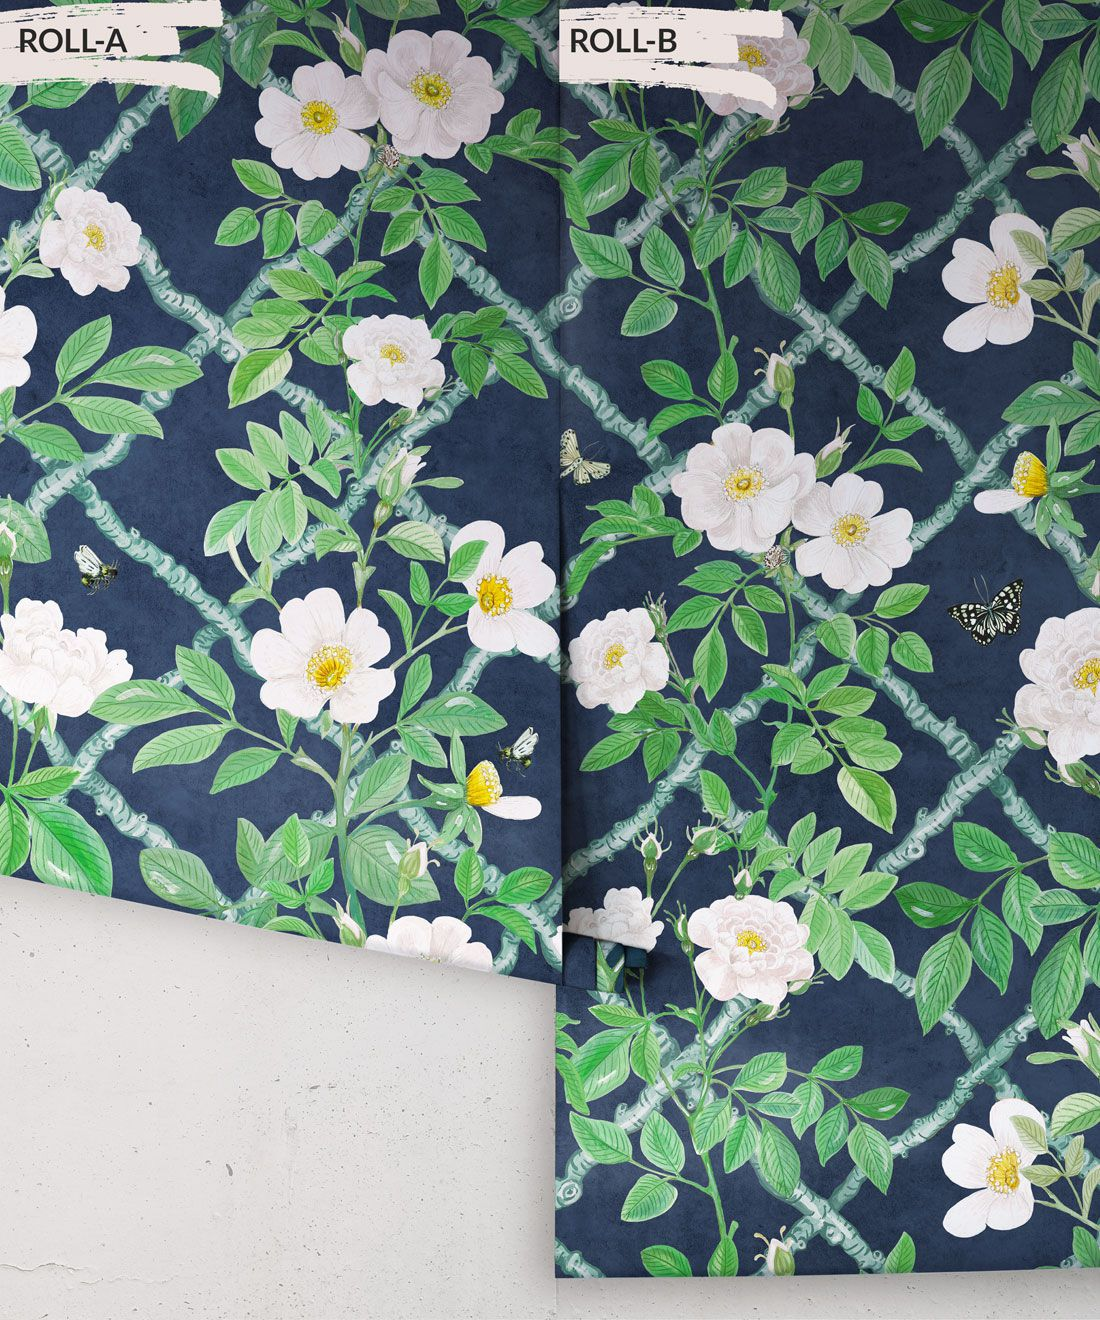 Treilage Wallpaper • Floral Wallpaper • Royal Blue • Rolls